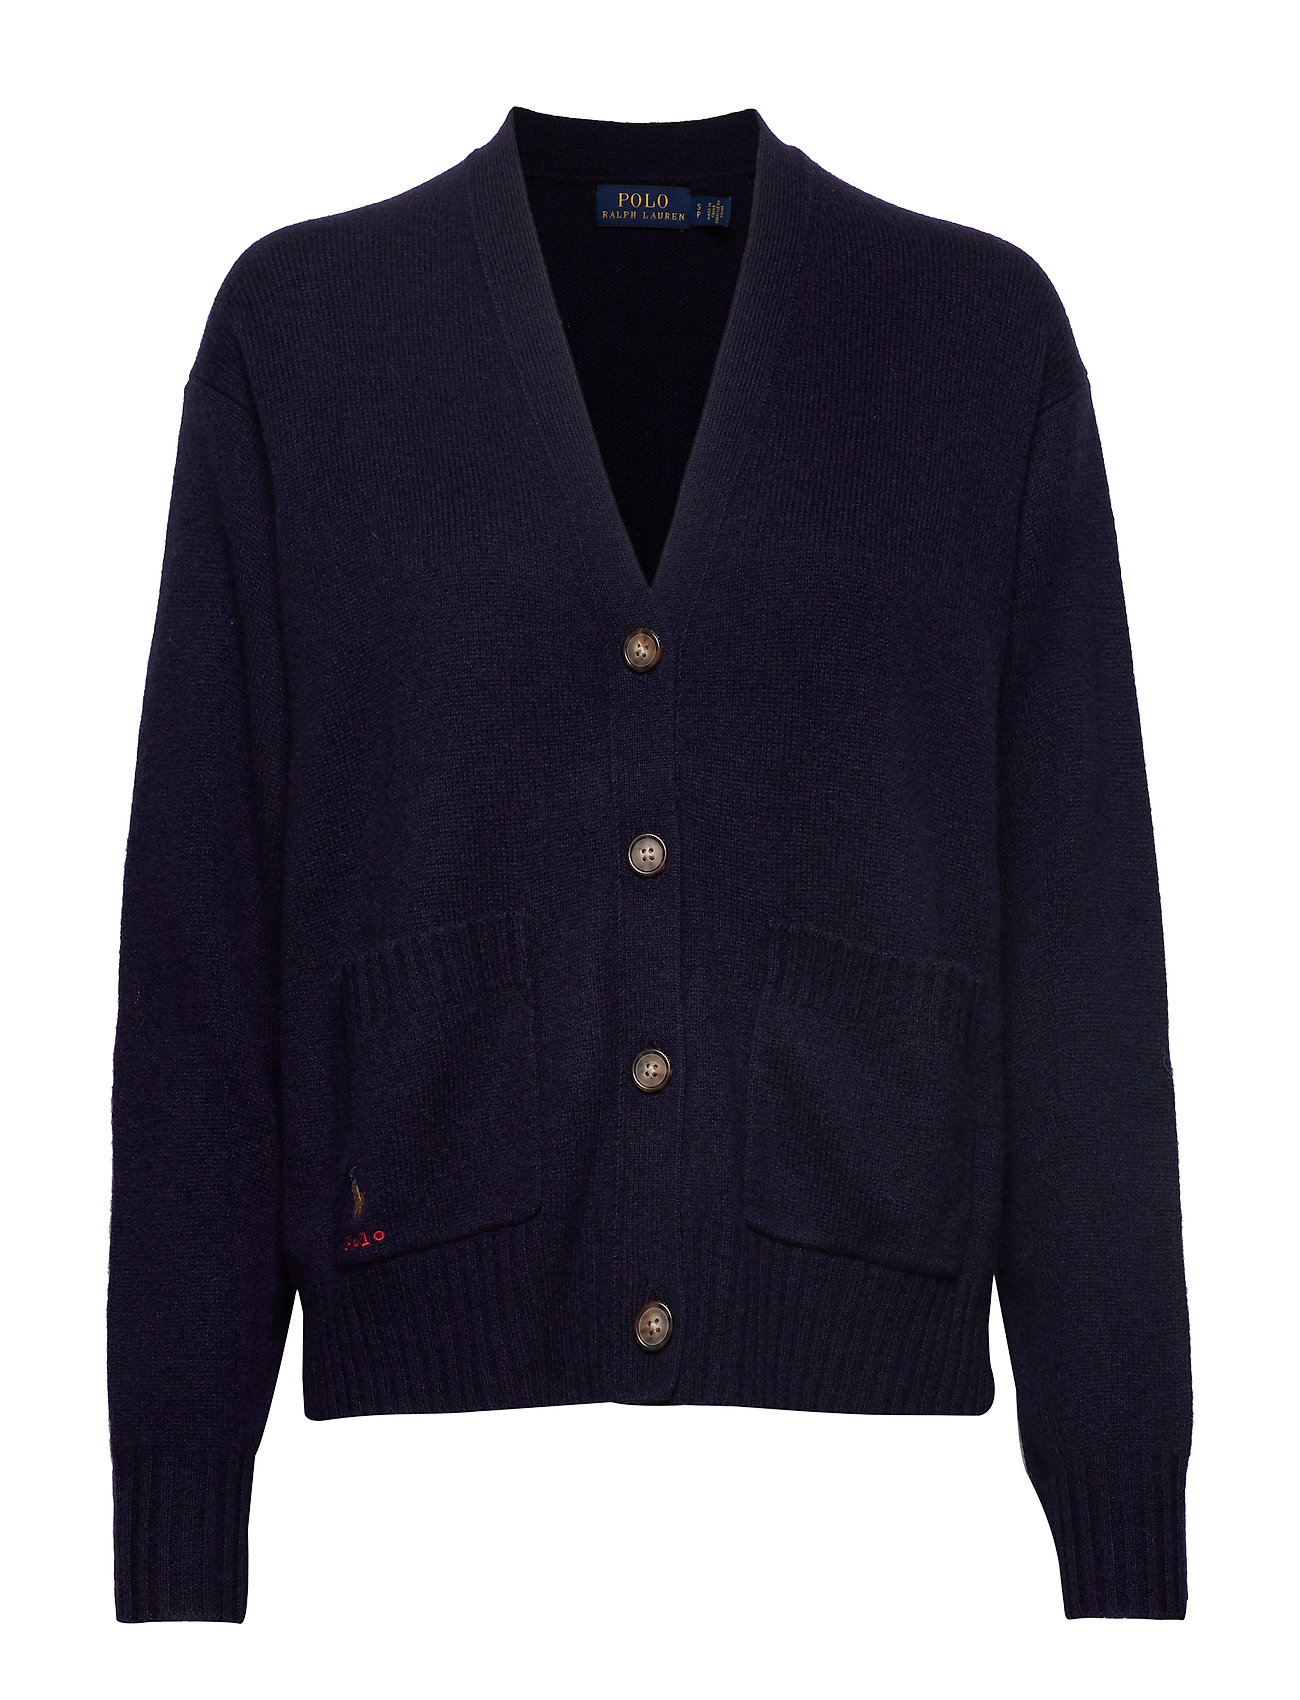 Polo Ralph Lauren Wool Long-Sleeve Cardigan - HUNTER NAVY